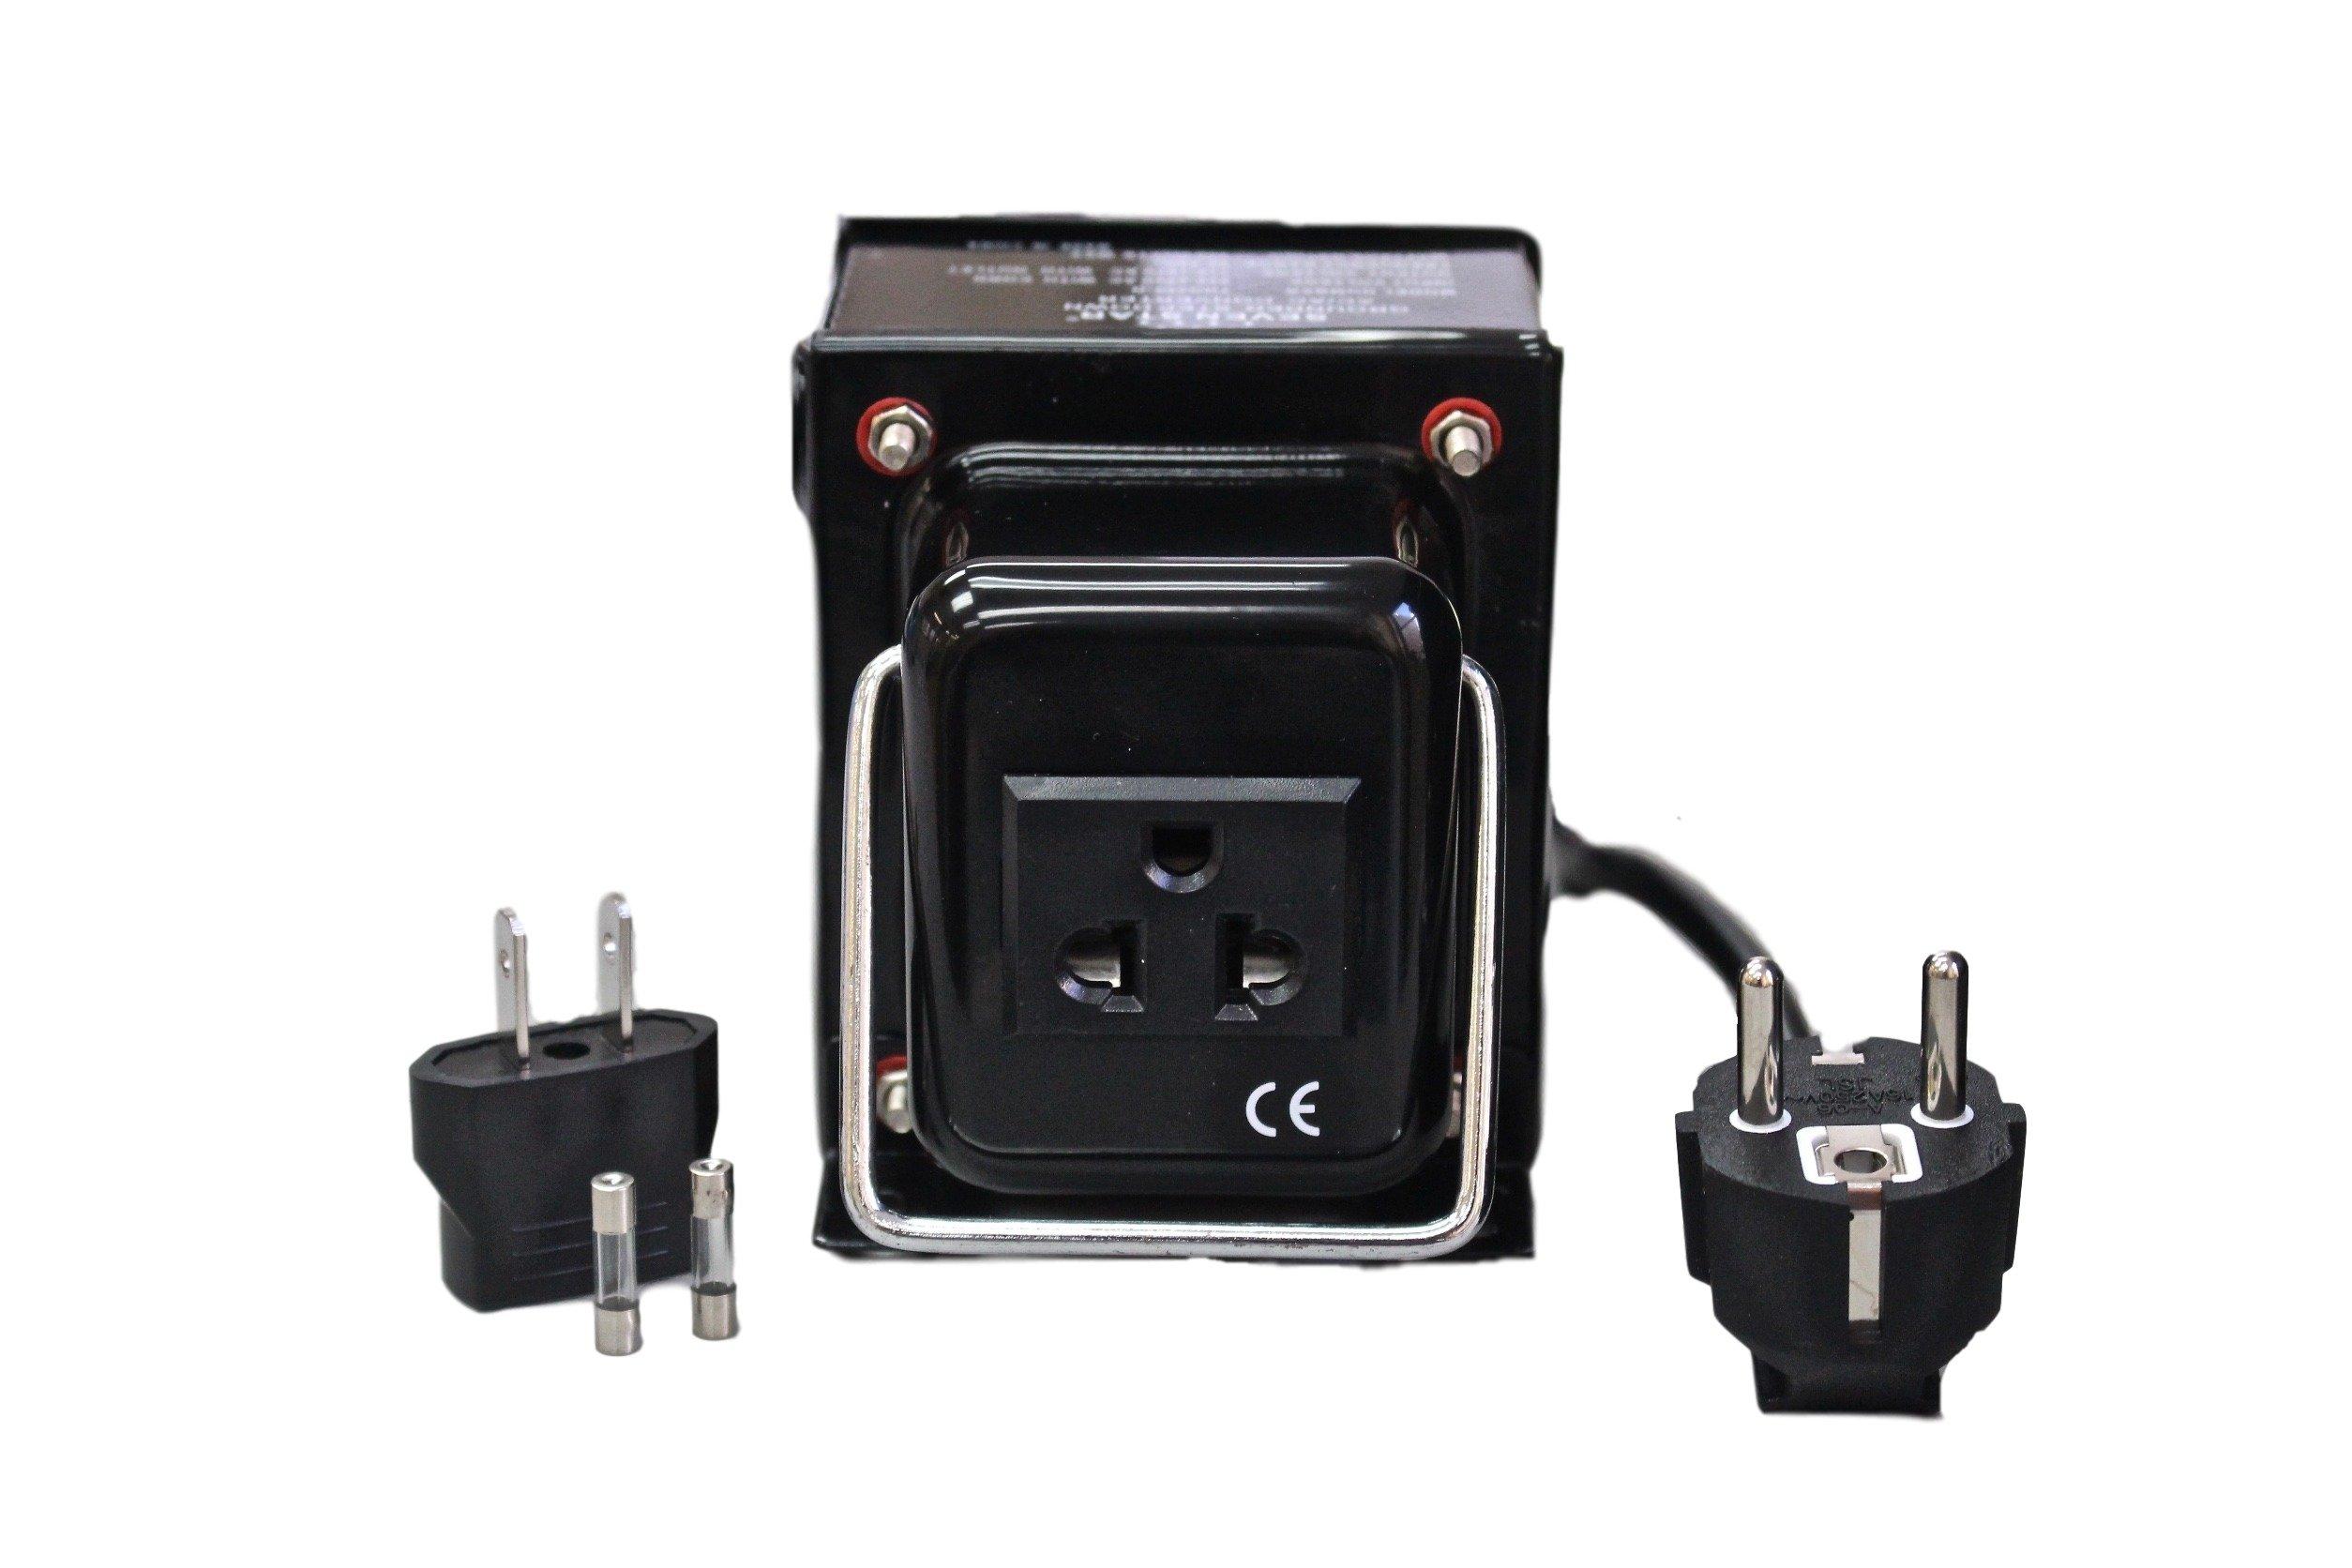 Circuit Breaker Identifier Tracing Plug Sockets To Circuit Breakers